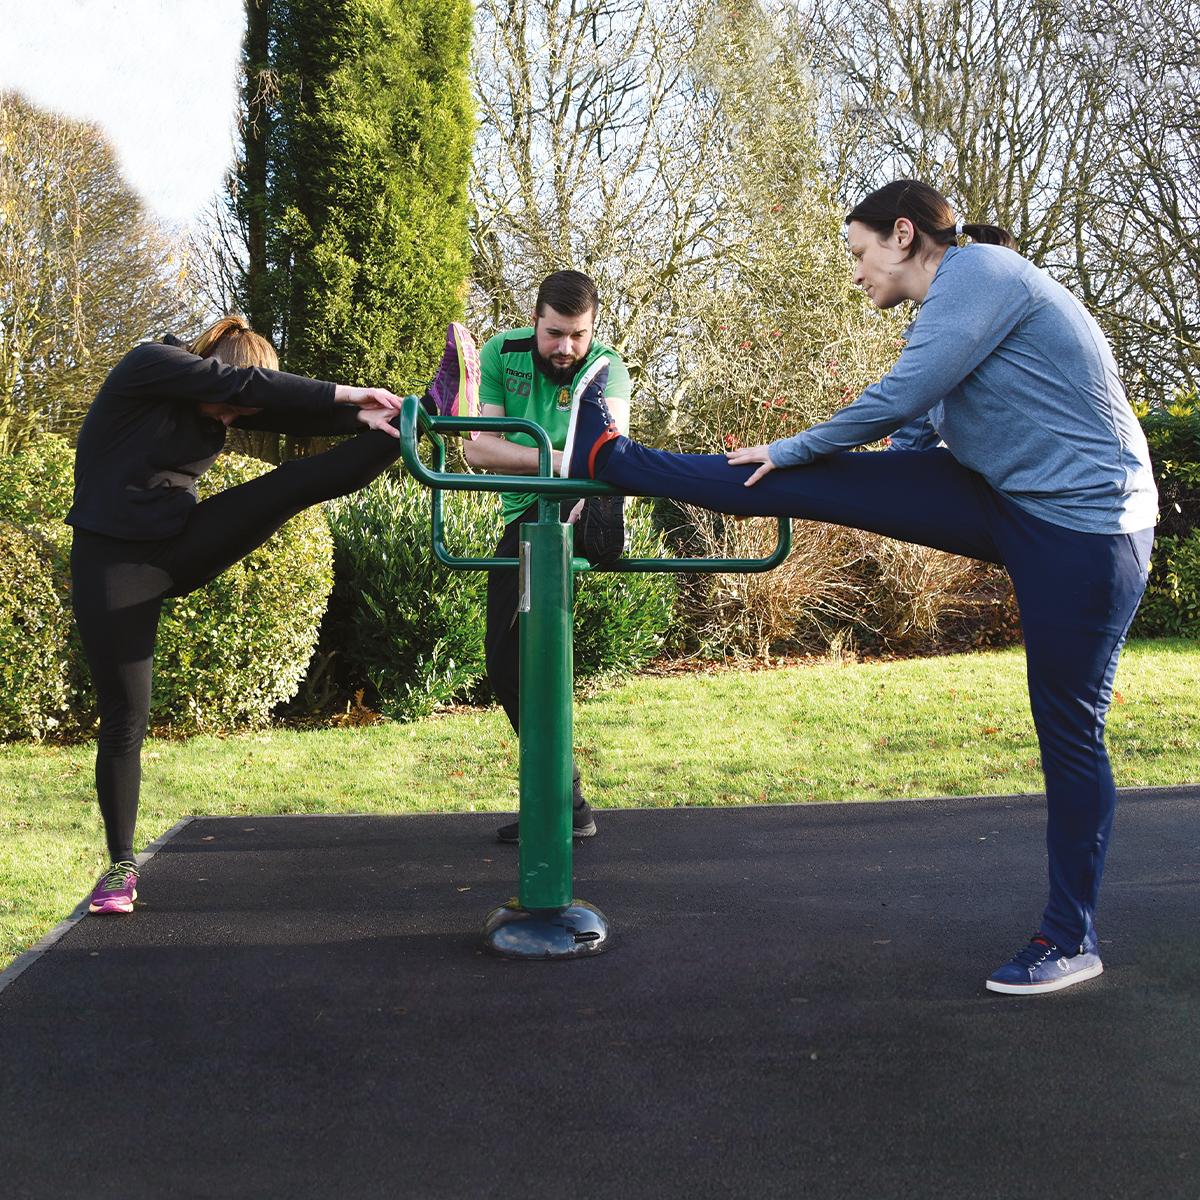 leg stretch   adults outdoor gym equipment